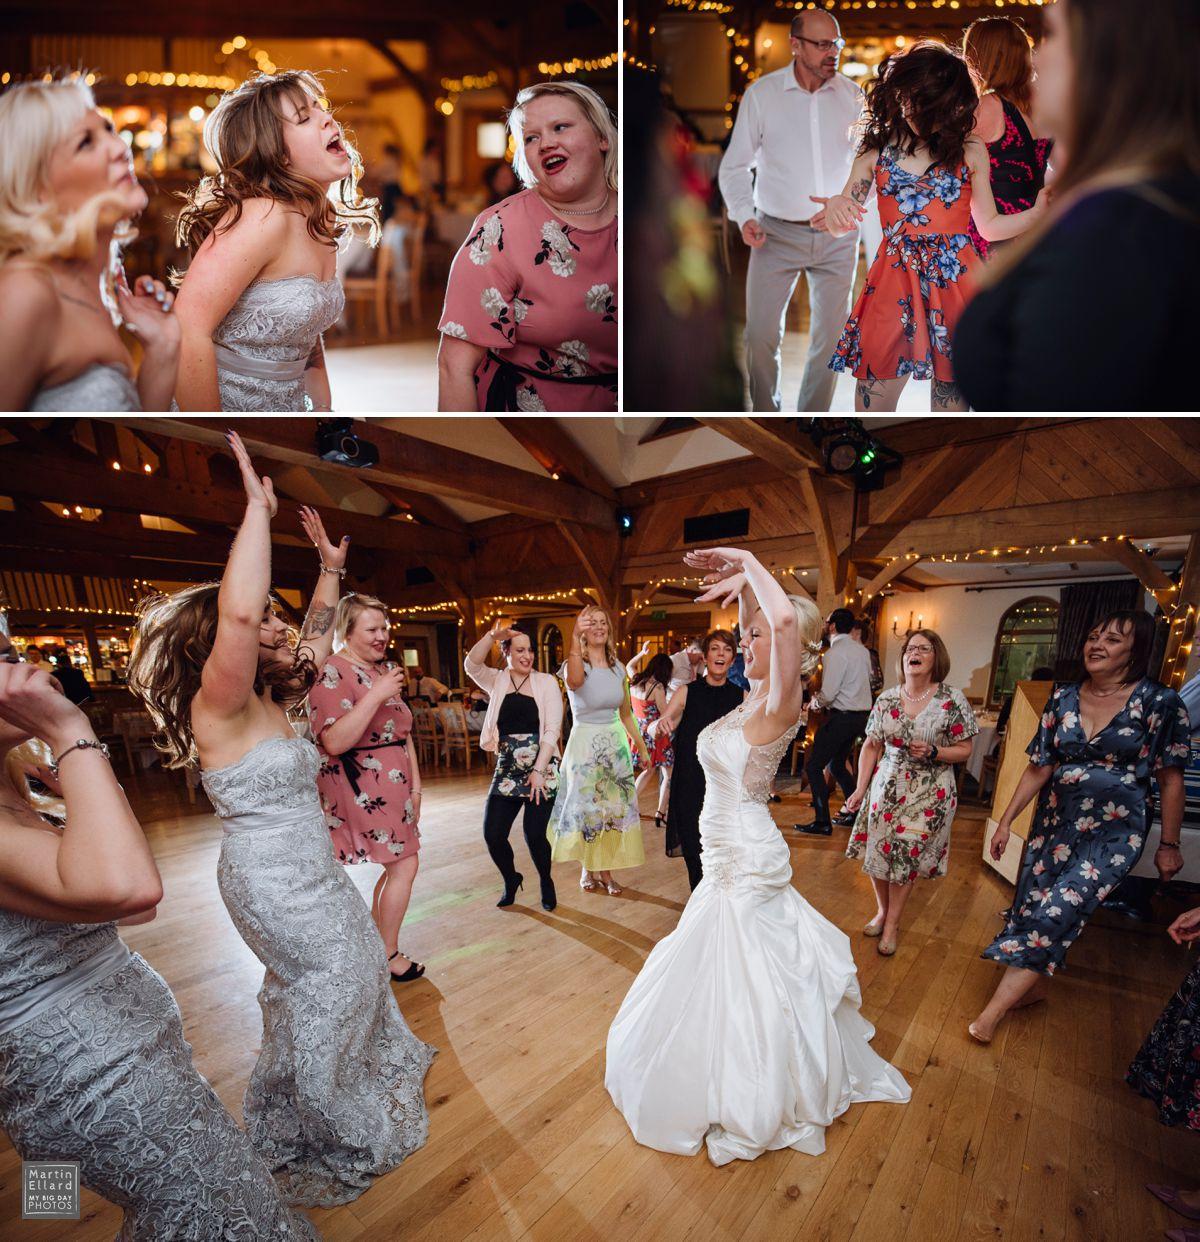 wedding dance floor mayhem